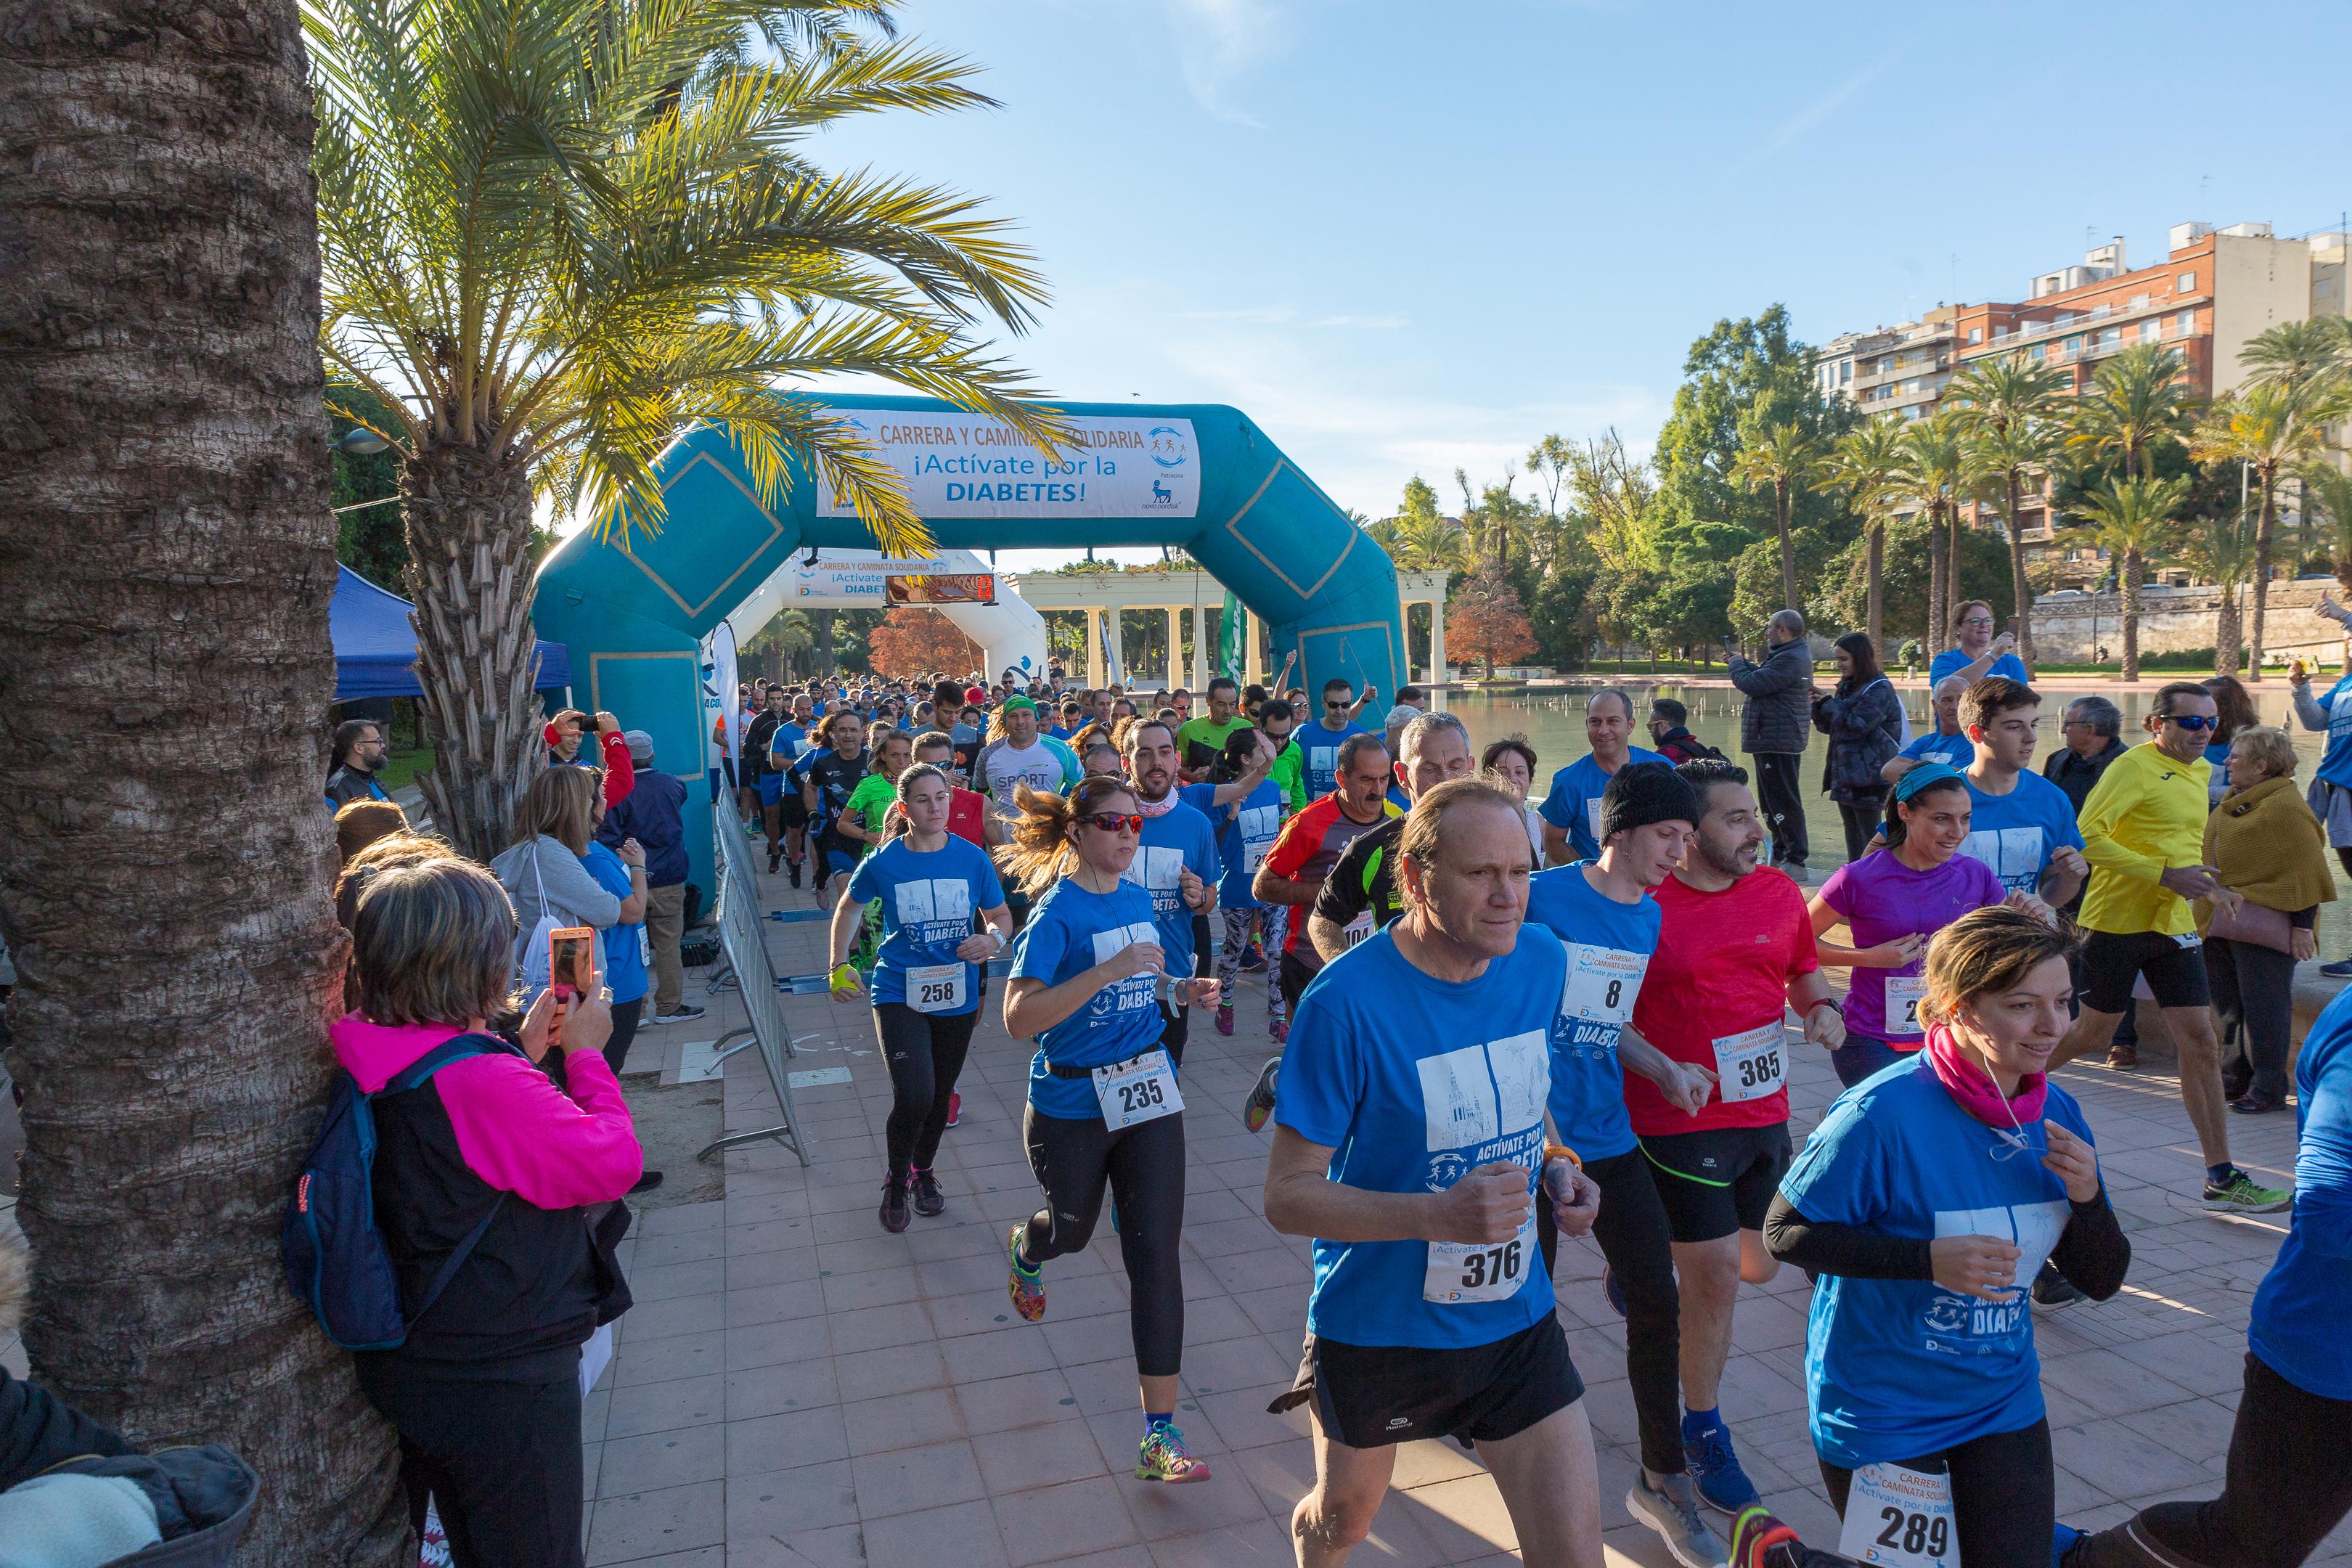 participación deportiva en diabetes tipo 1